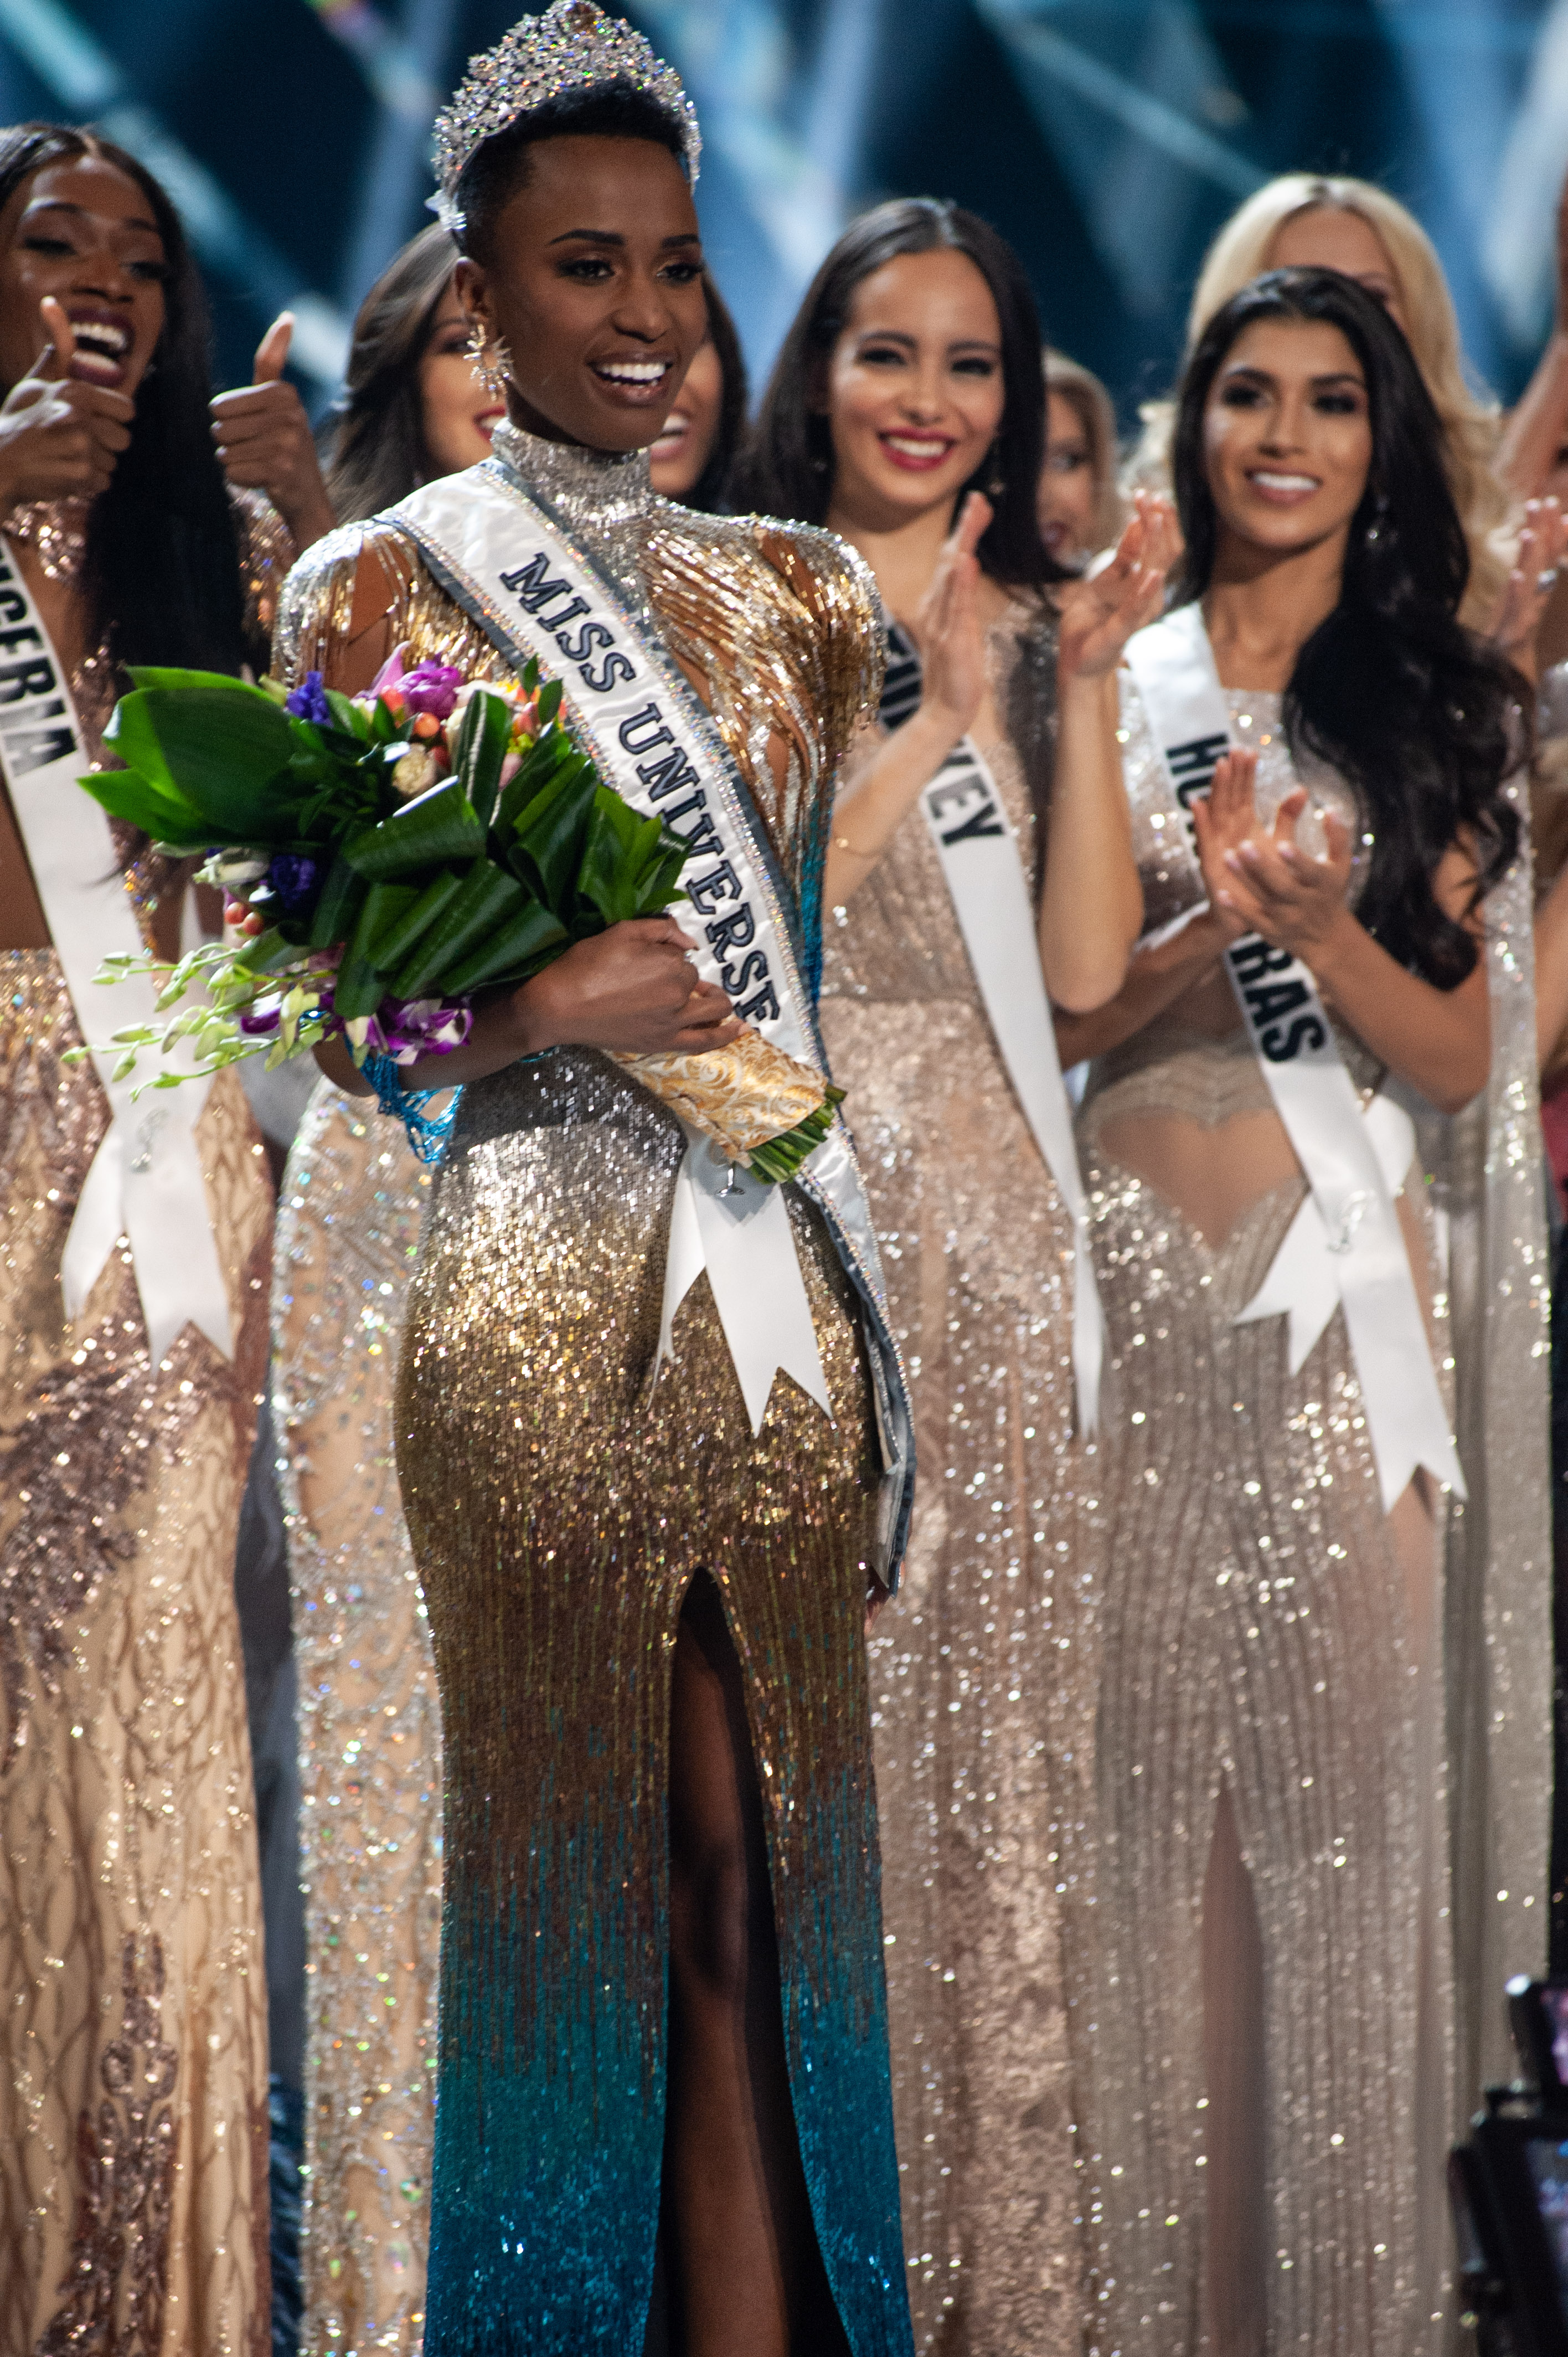 The crowning moment of the new Miss Universe 2019 Zozibini Tunzi.